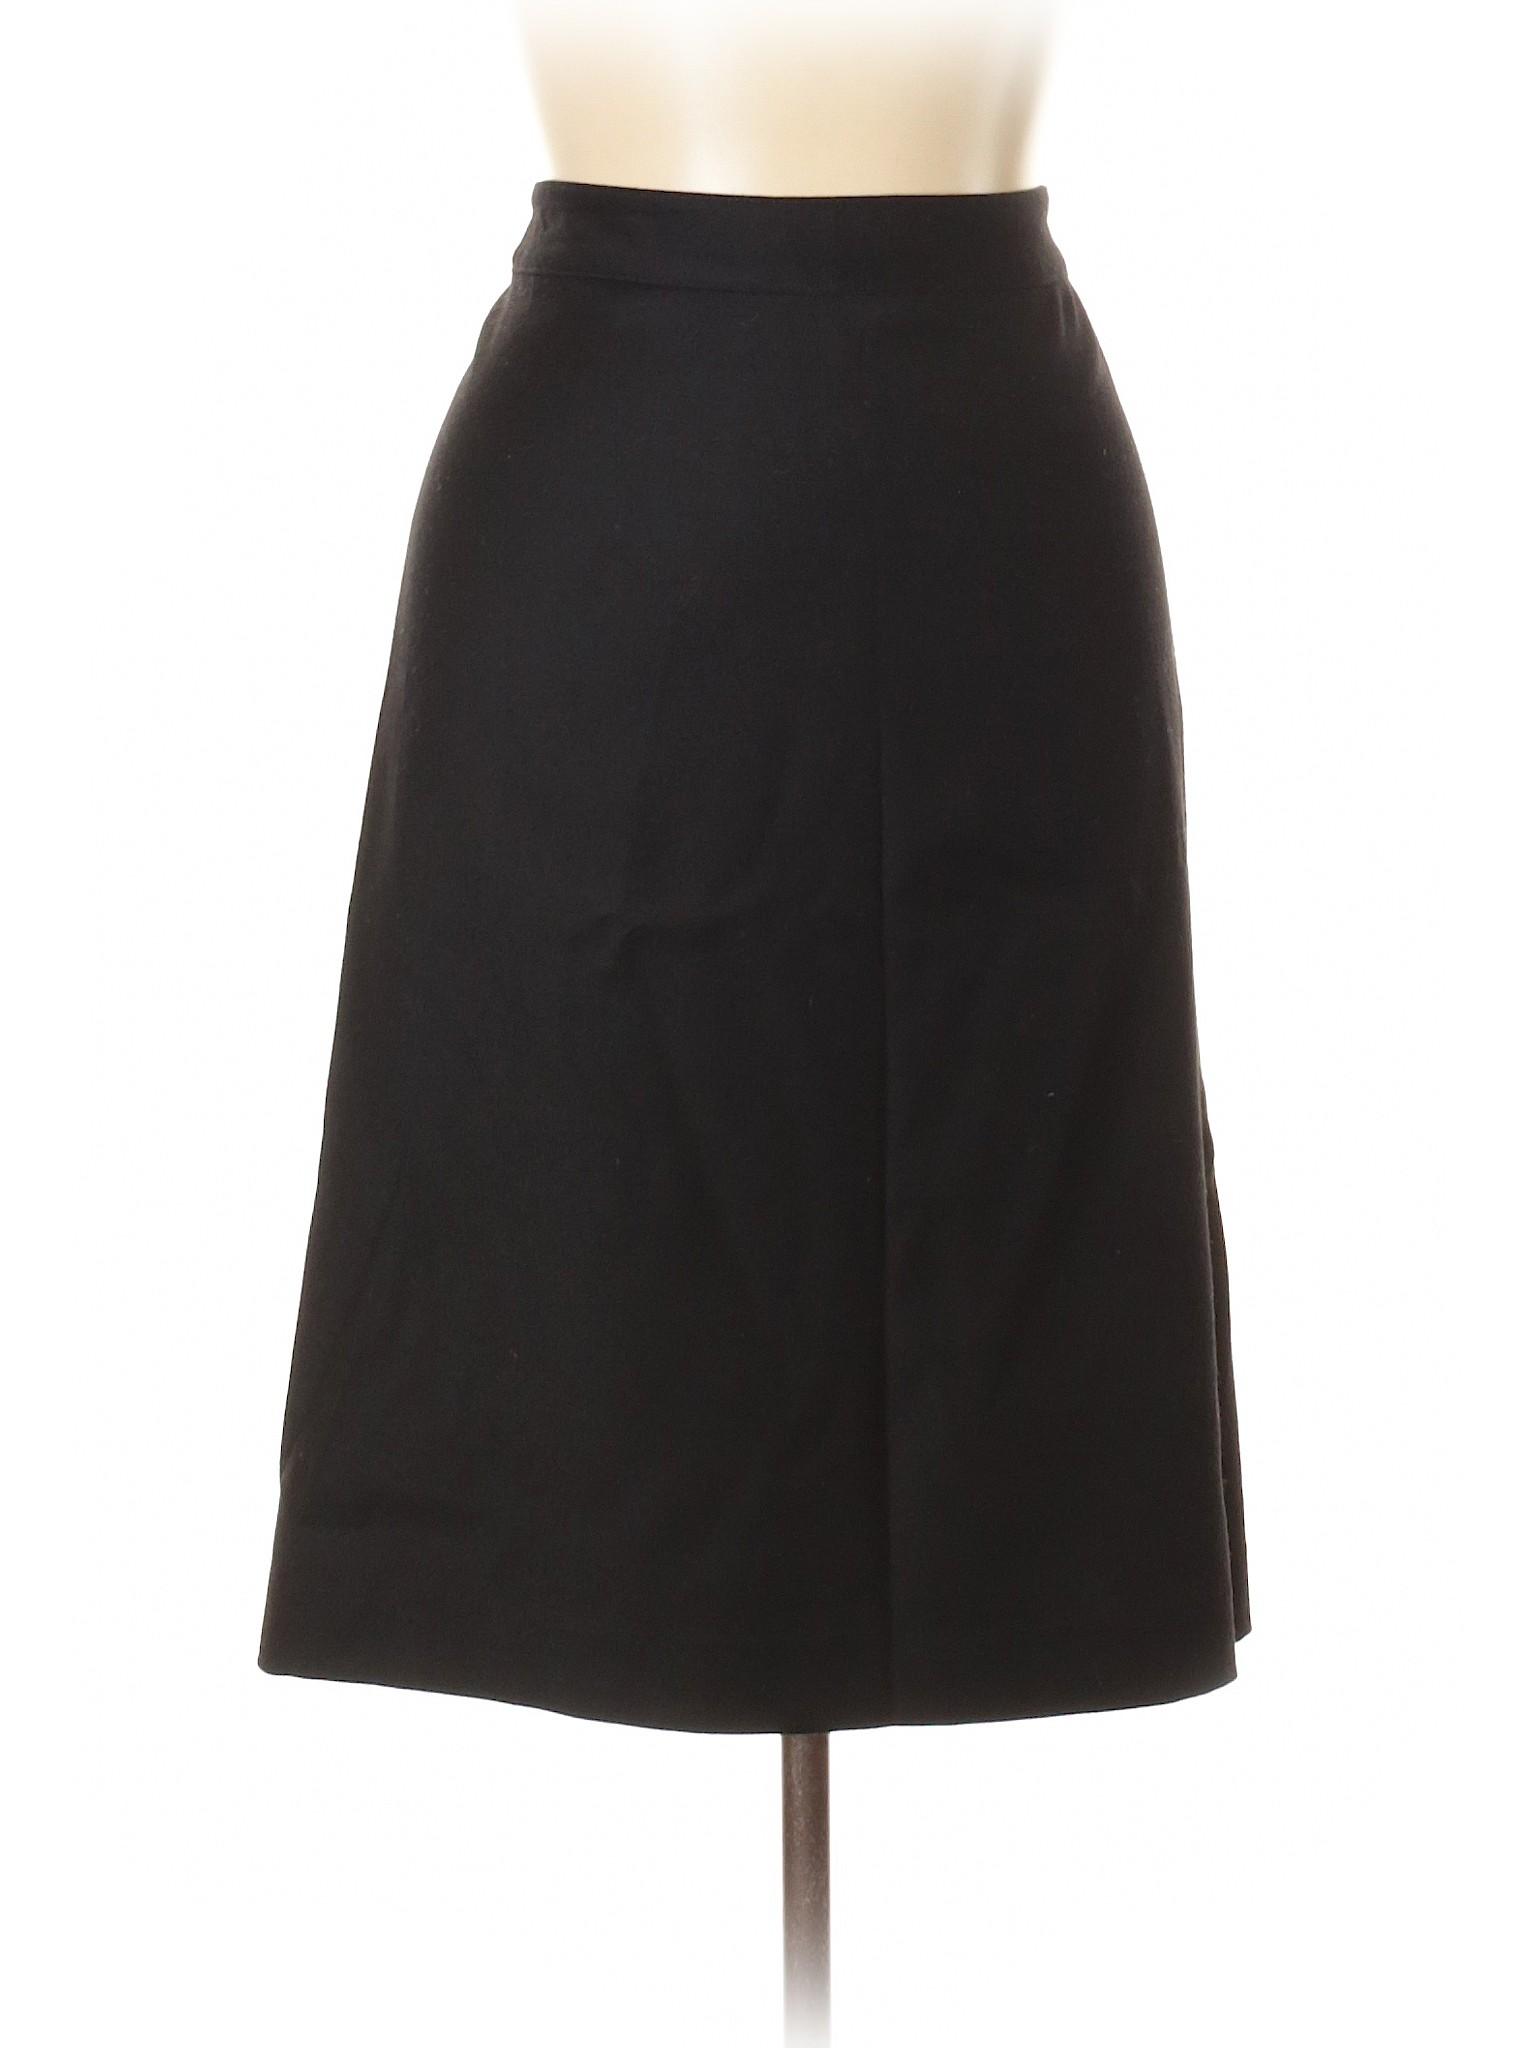 Banana Republic Skirt Wool Boutique leisure SzFqTw8Z